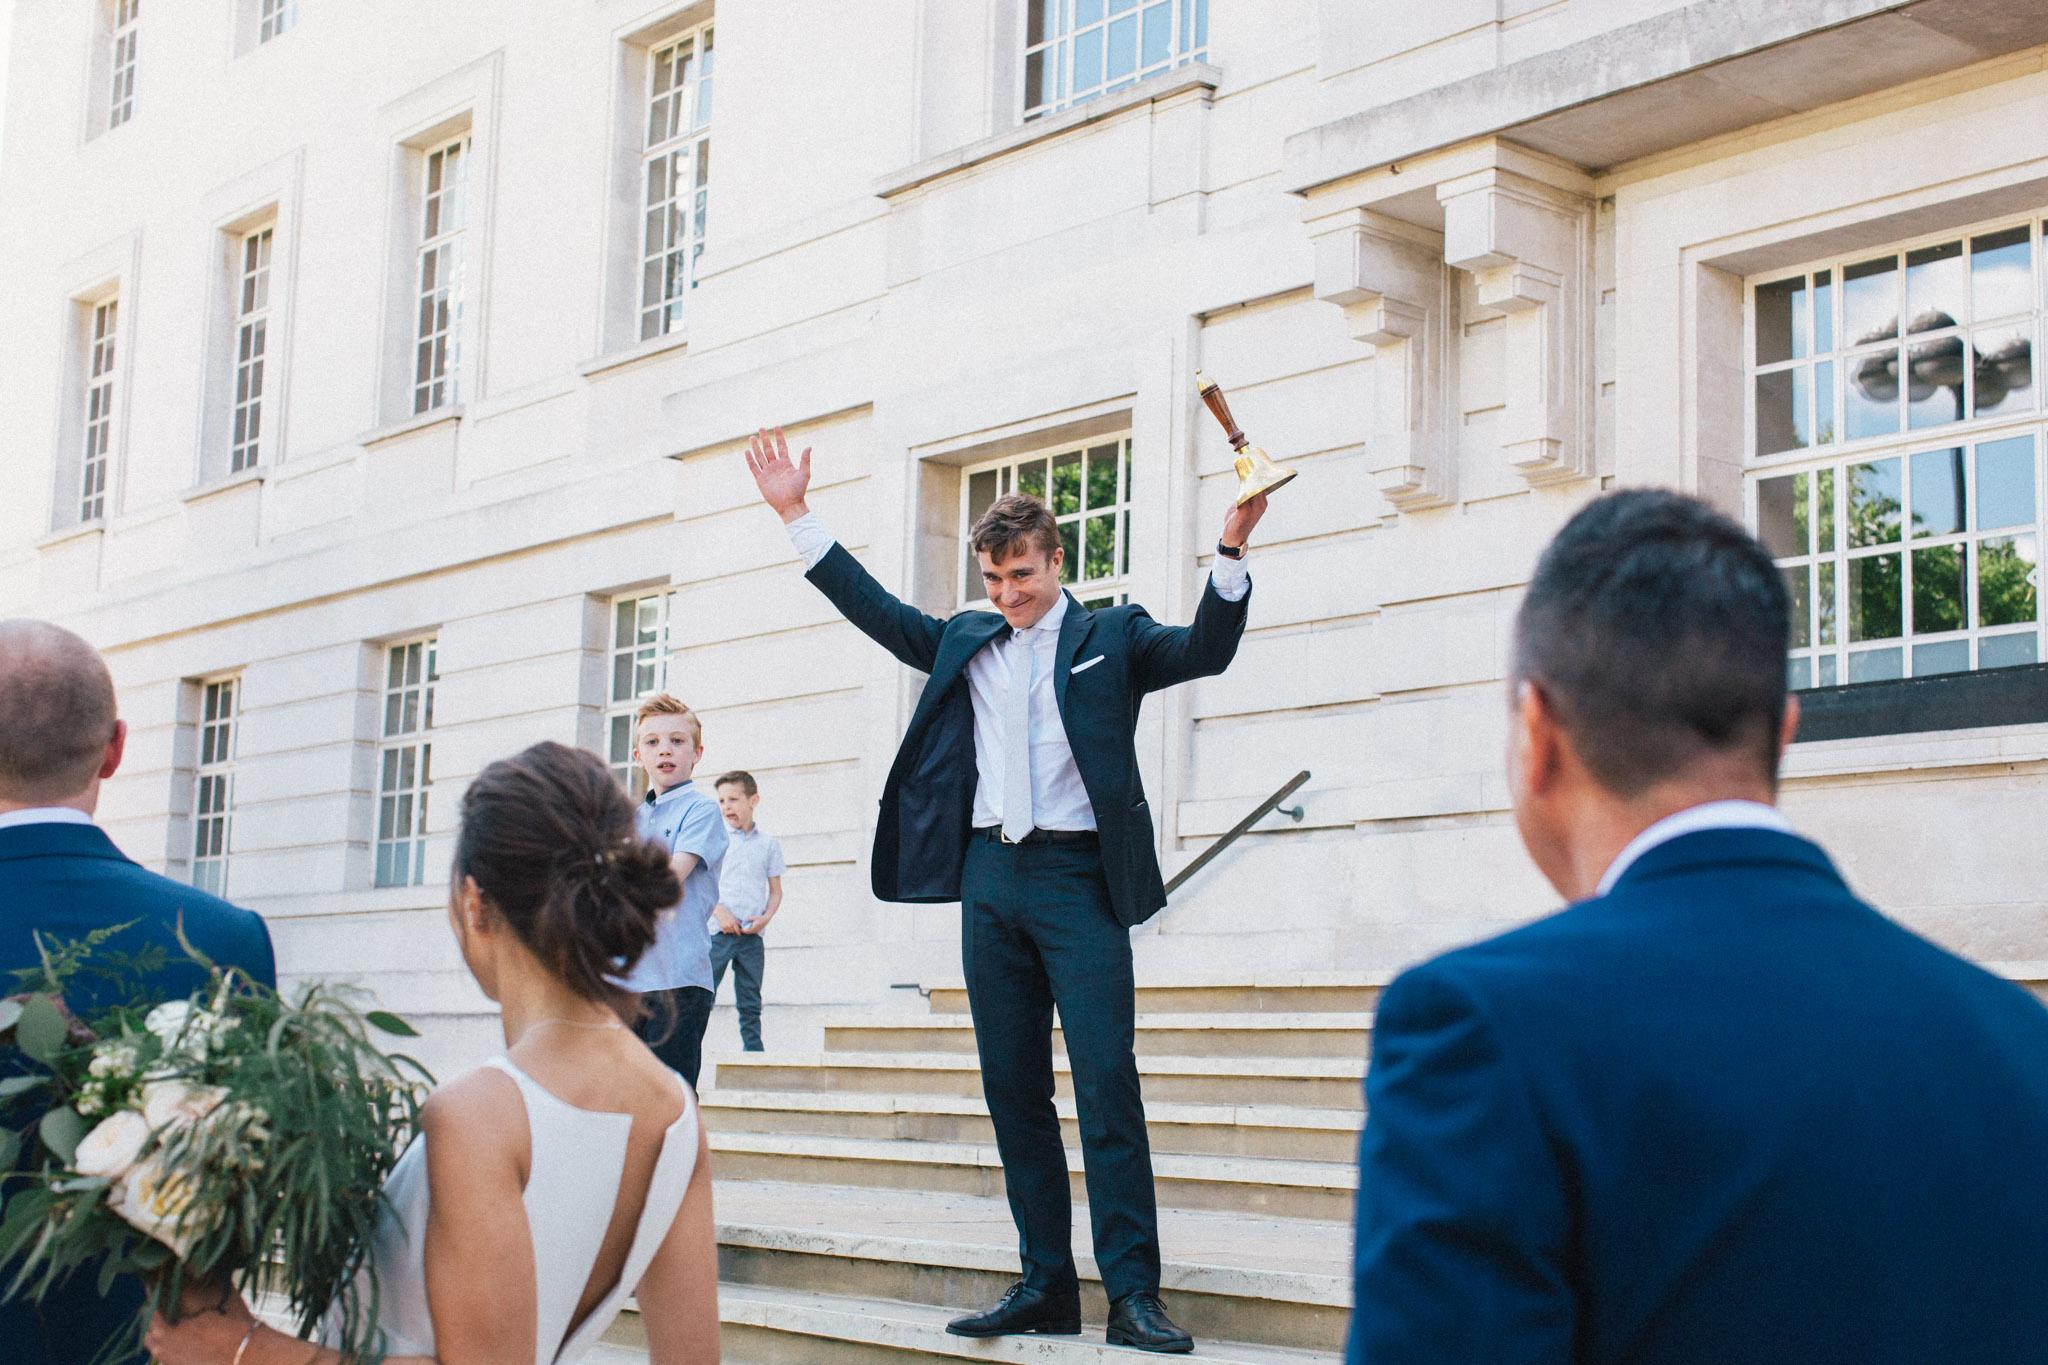 trinity_buoy_wharf_hackney_town_hall_wedding_381.jpg